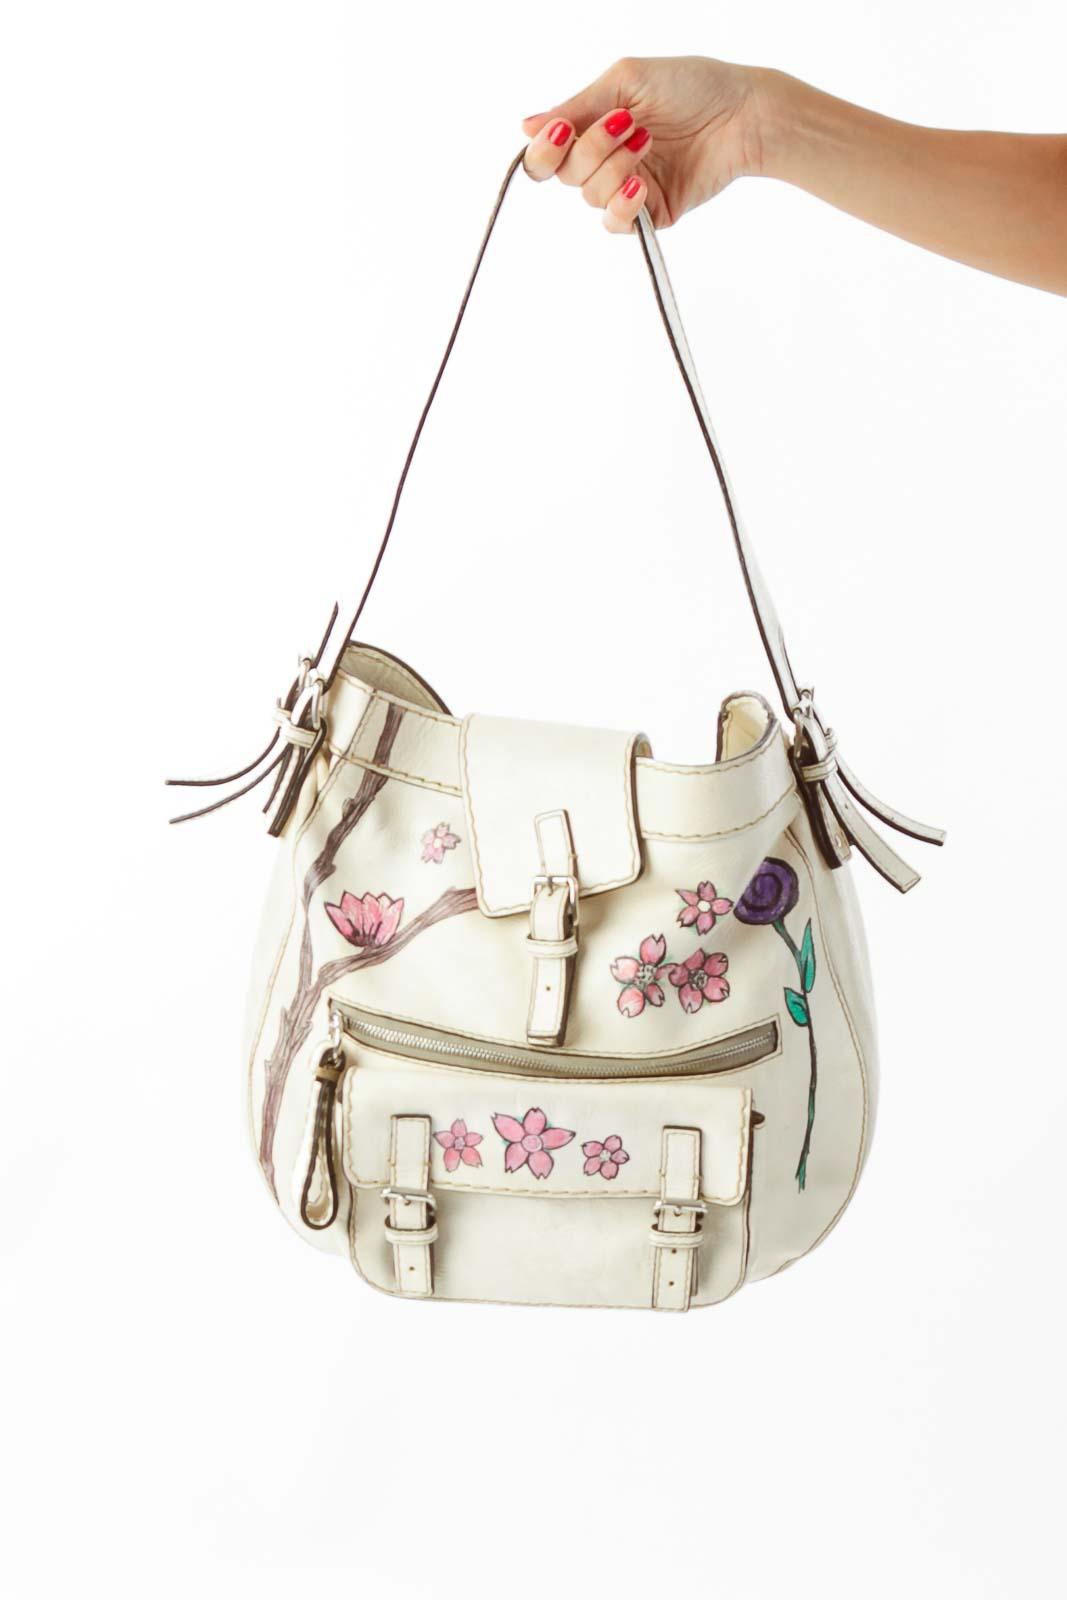 Cream Chloe Bag w/ Flower Details* Front